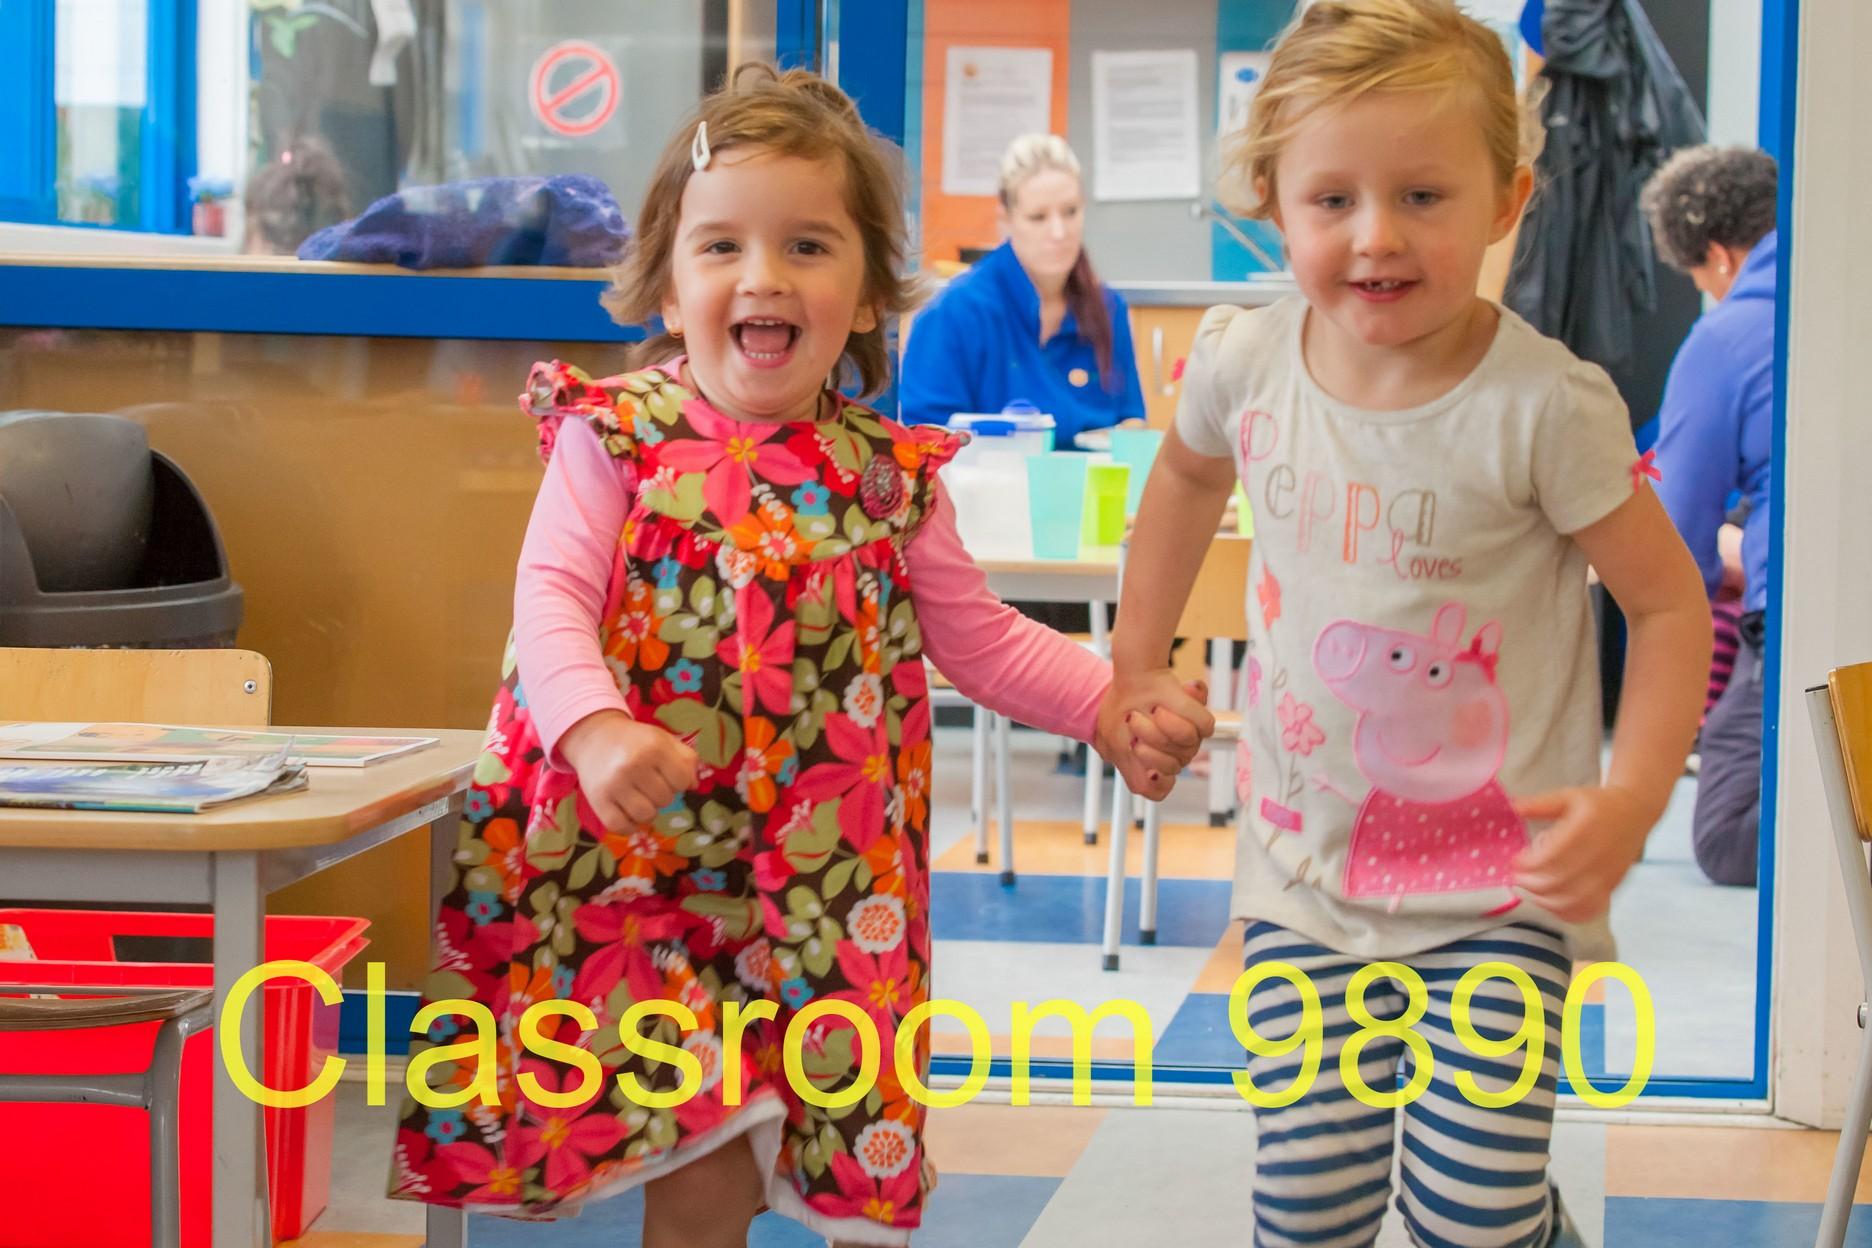 Classroom 9890